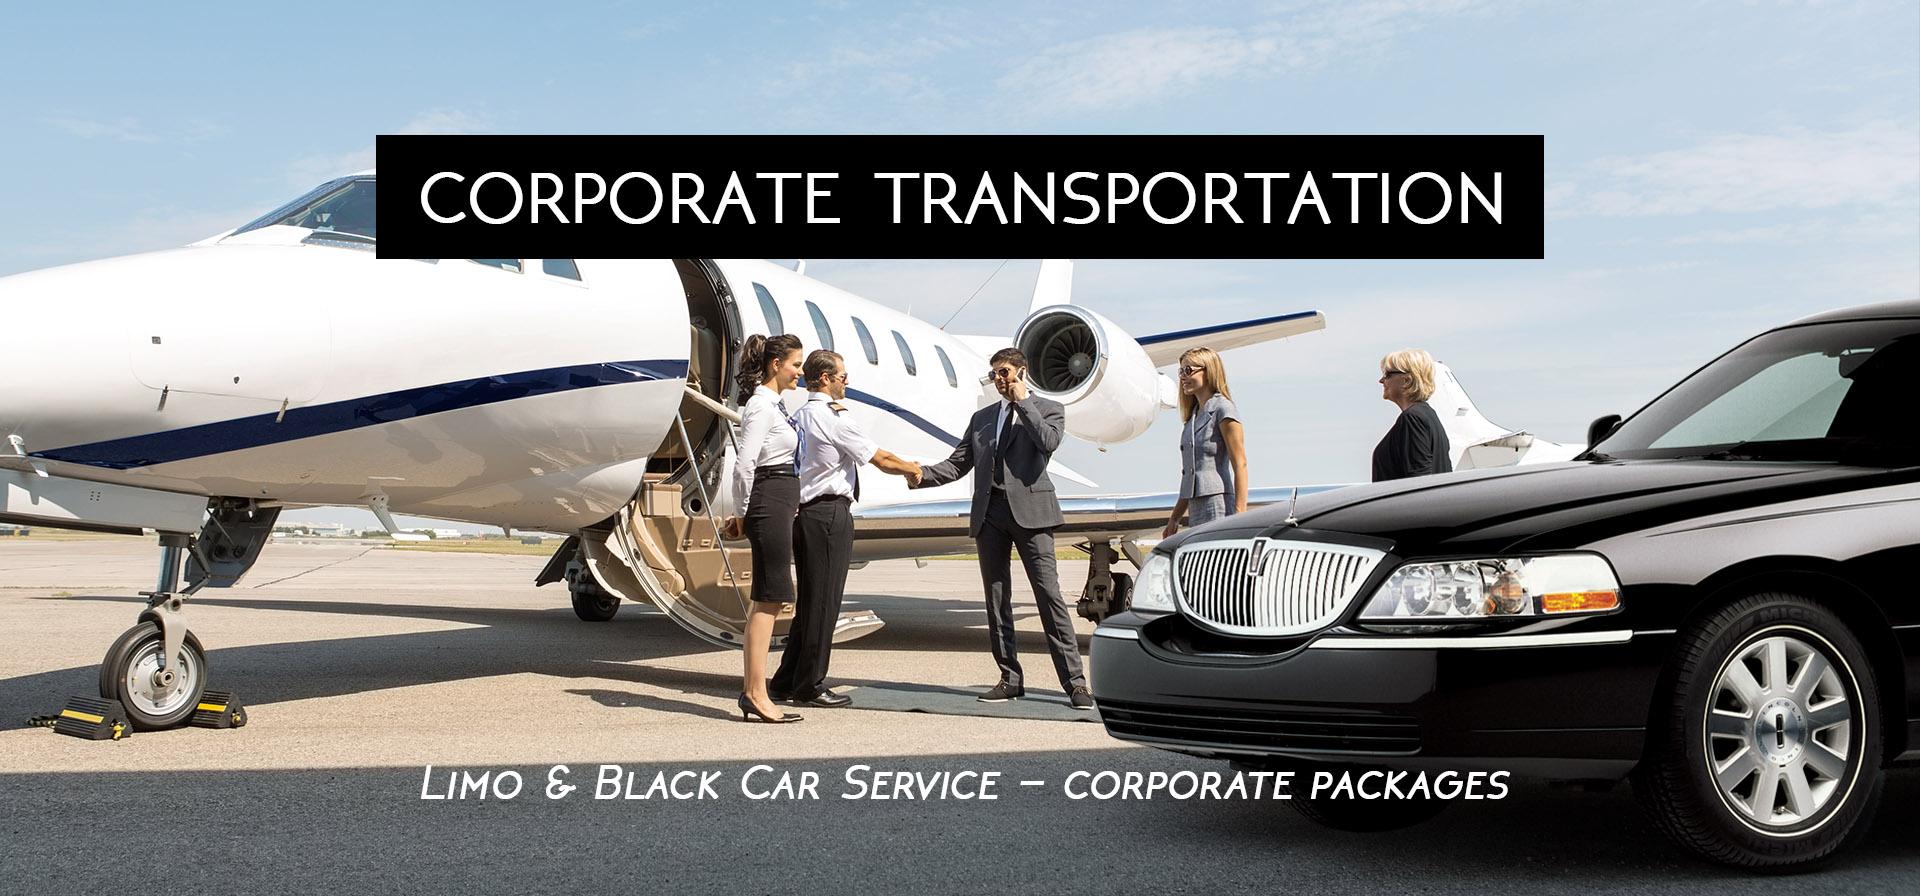 corporate-transportation-nj-airport-bg